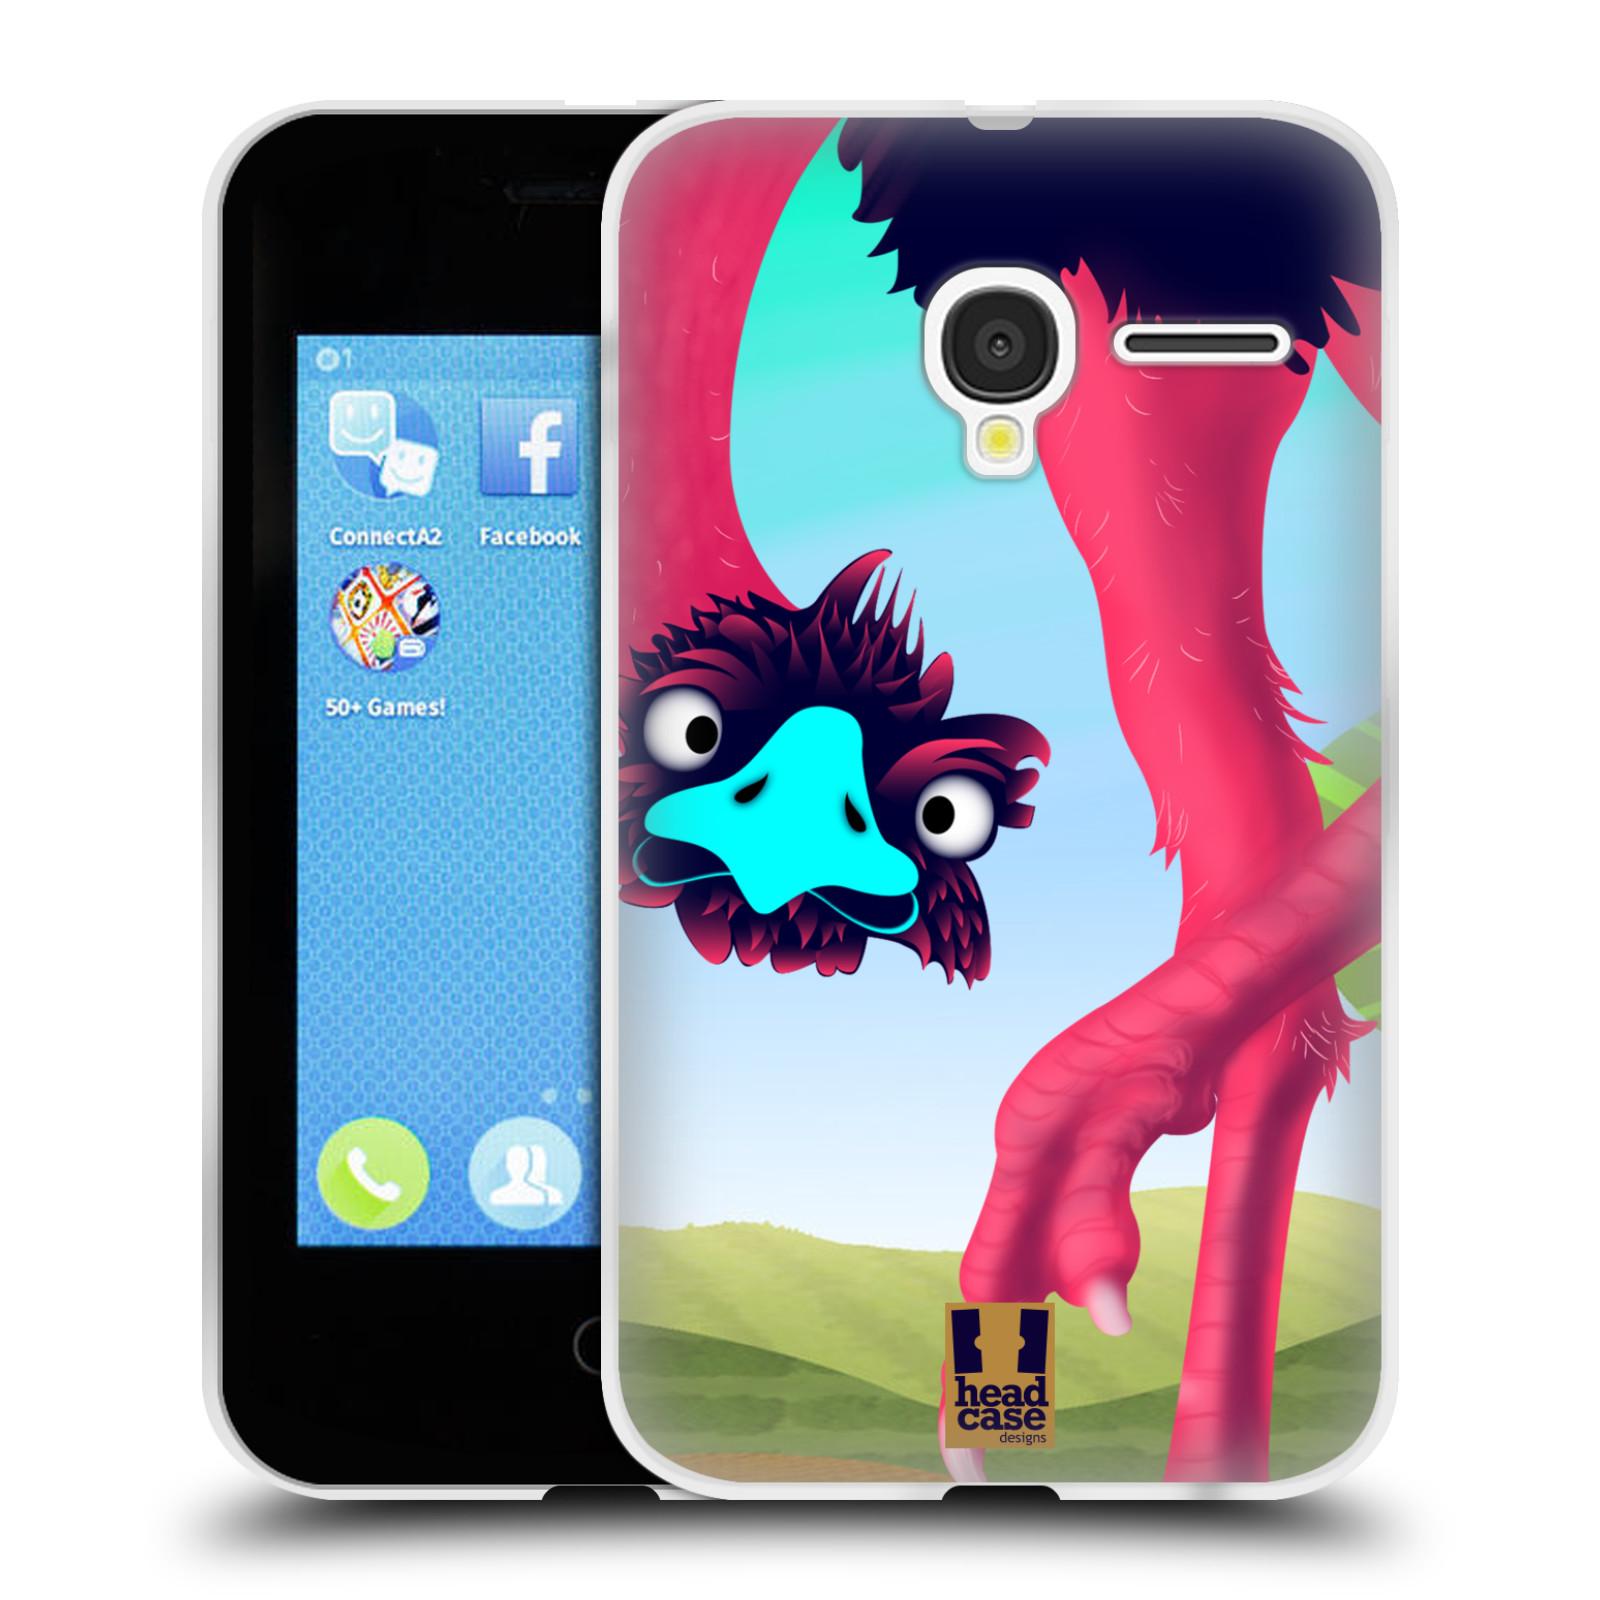 HEAD CASE silikonový obal na mobil Alcatel PIXI 3 OT-4022D (3,5 palcový displej) vzor dlouhé nohy kreslená zvířátka pštros